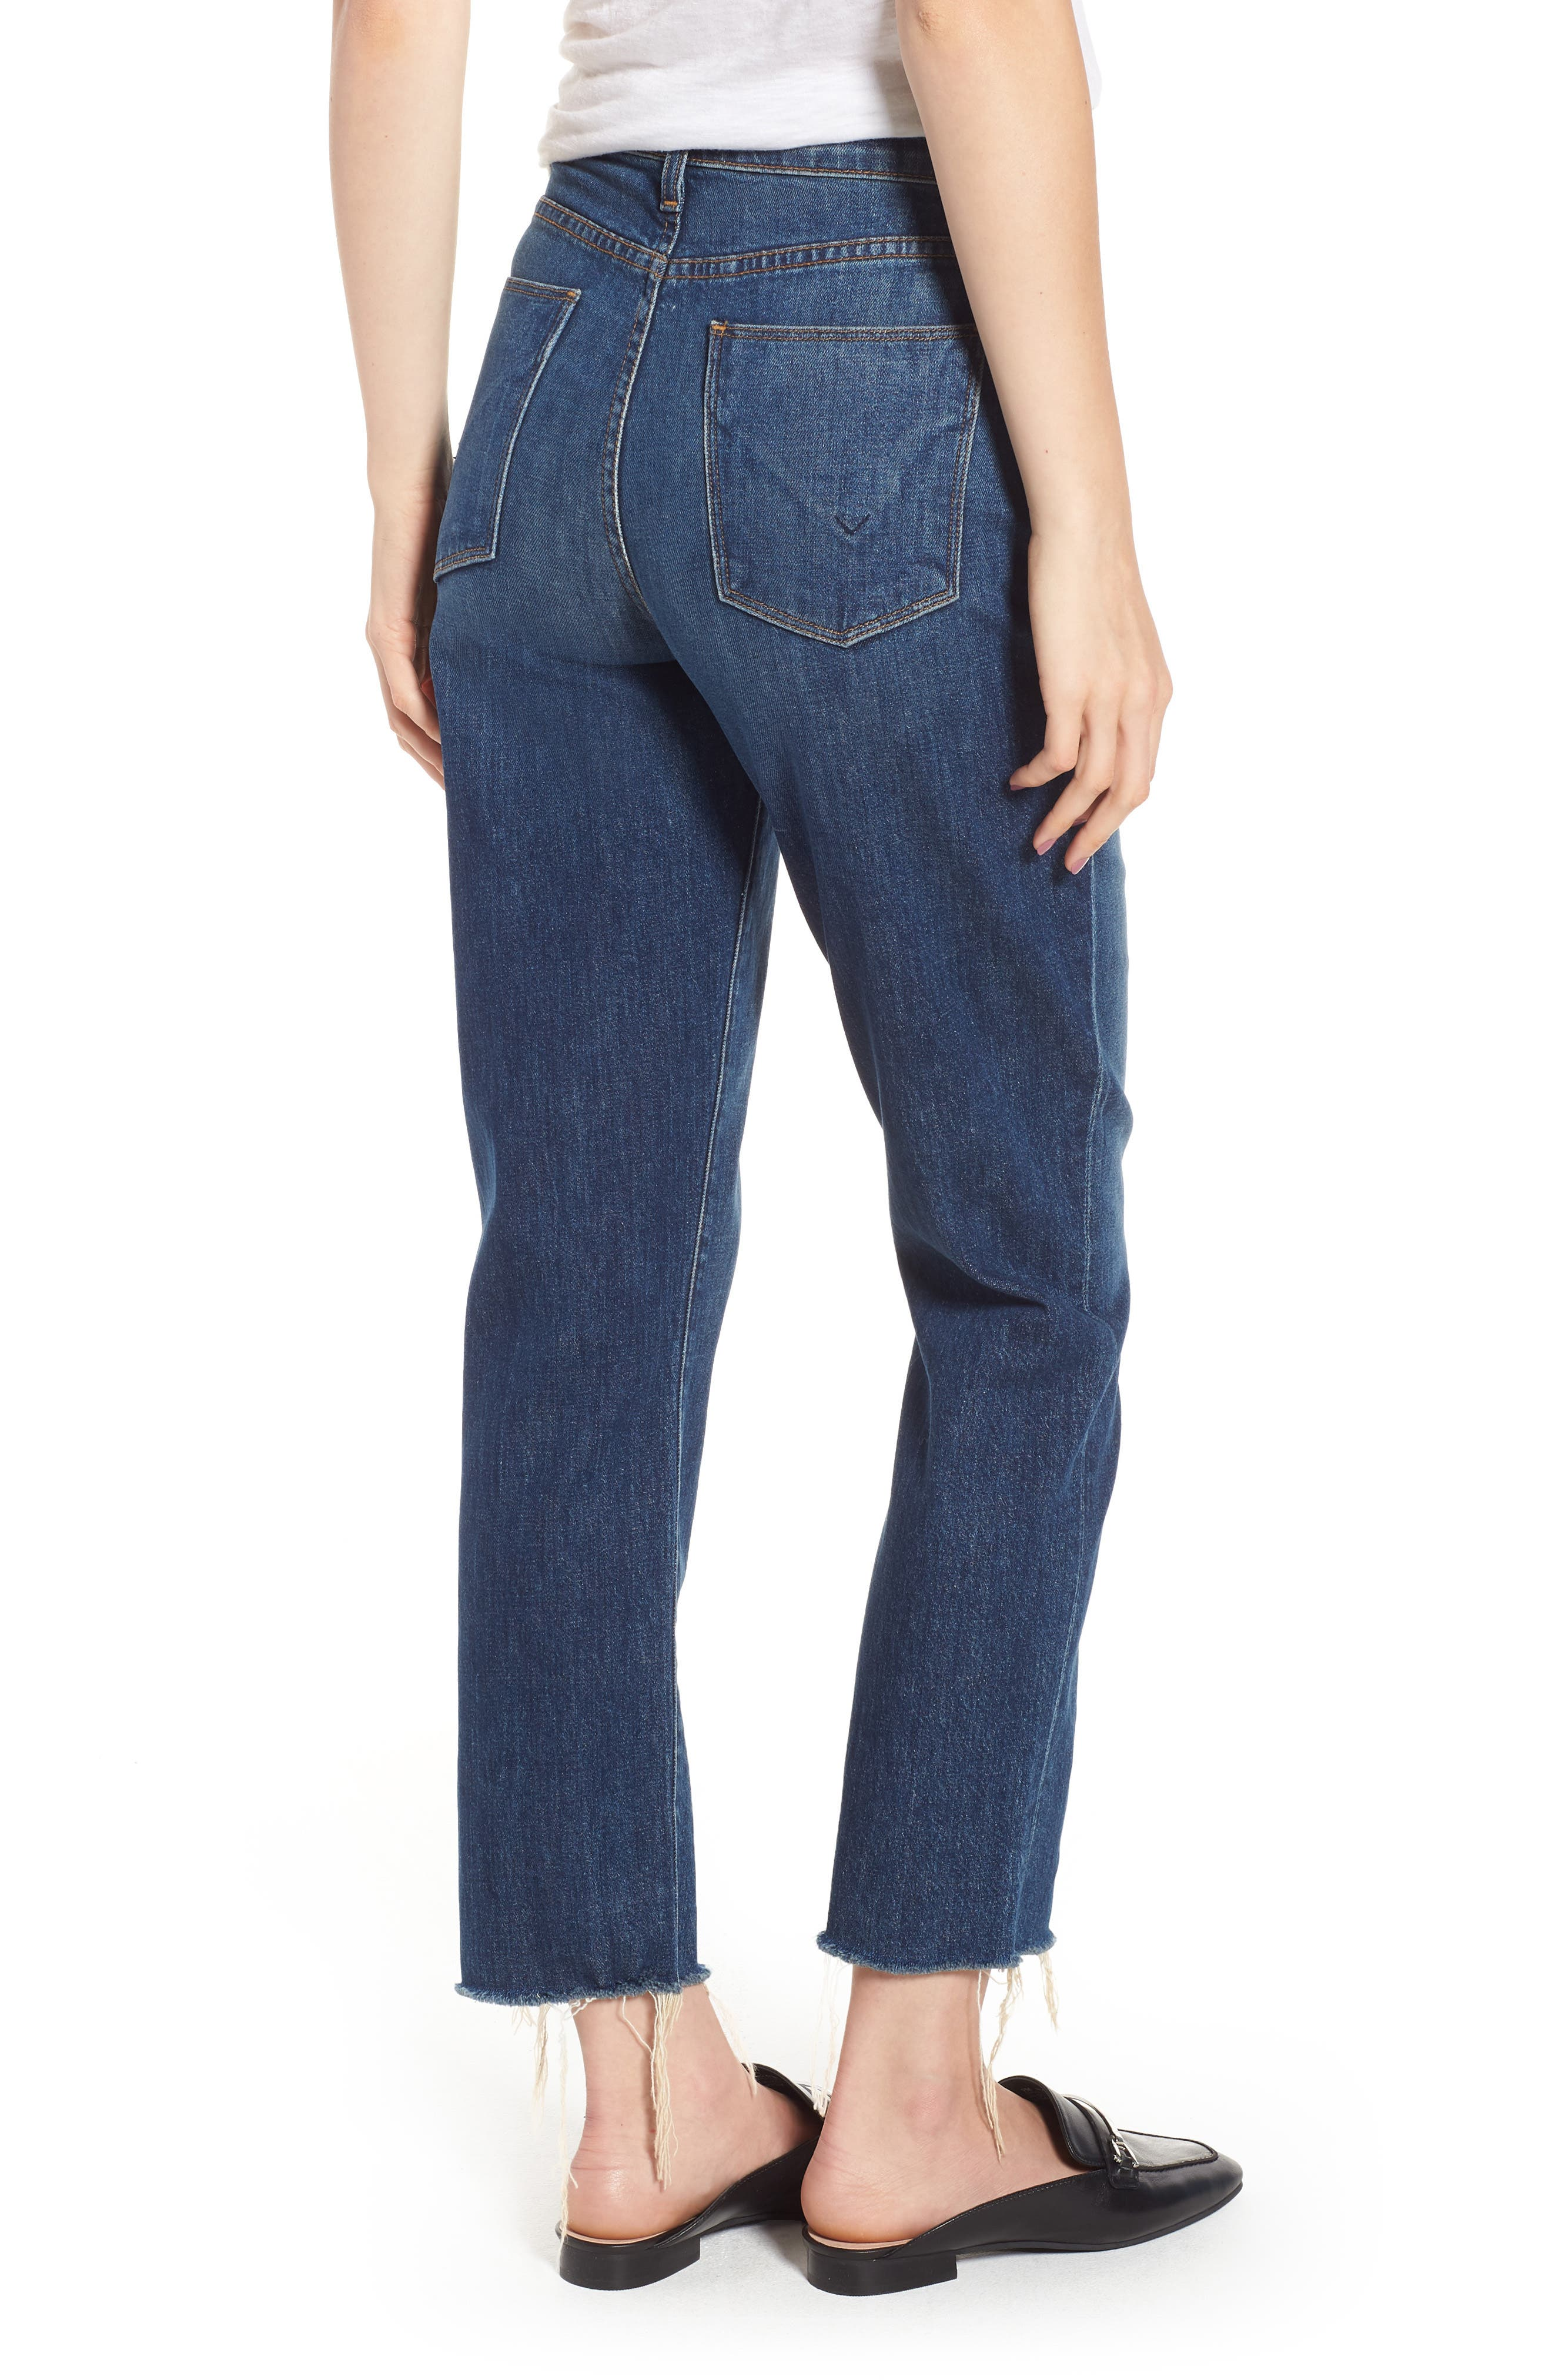 Zoeey High Waist Crop Straight Leg Jeans,                             Alternate thumbnail 2, color,                             402